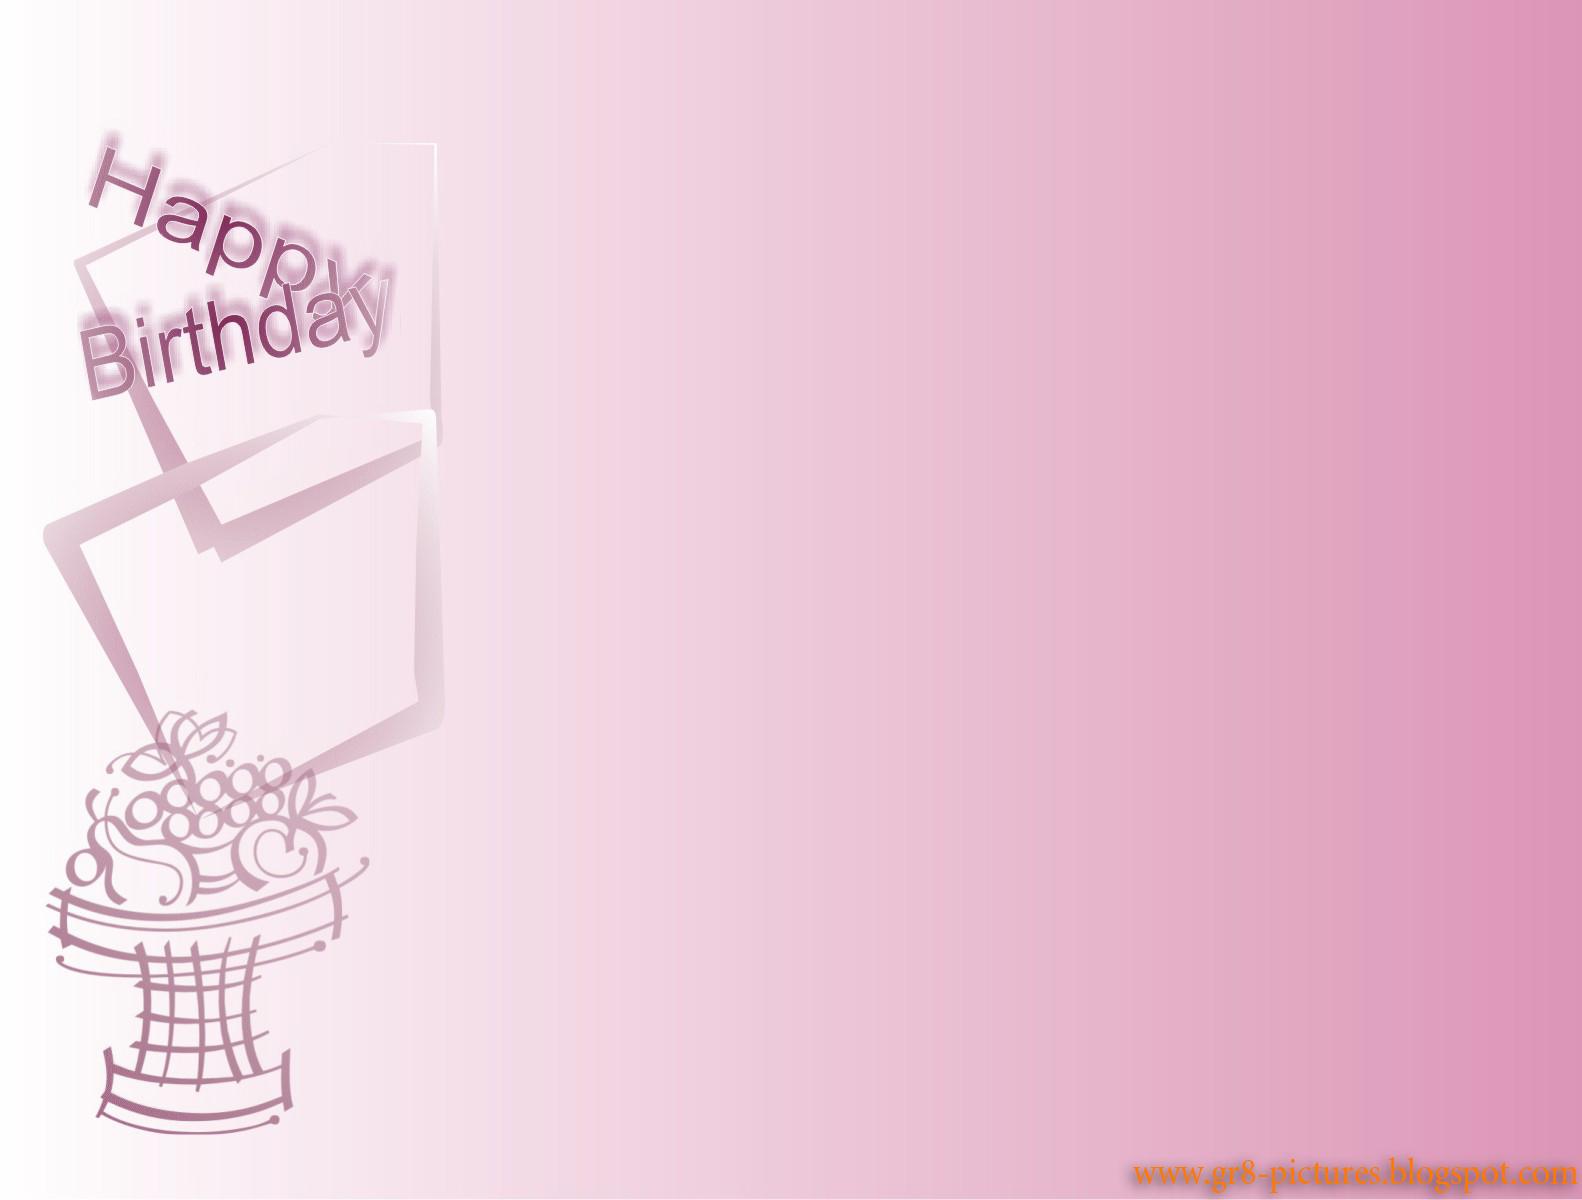 Pink happy birthday wallpaper 1582x1200